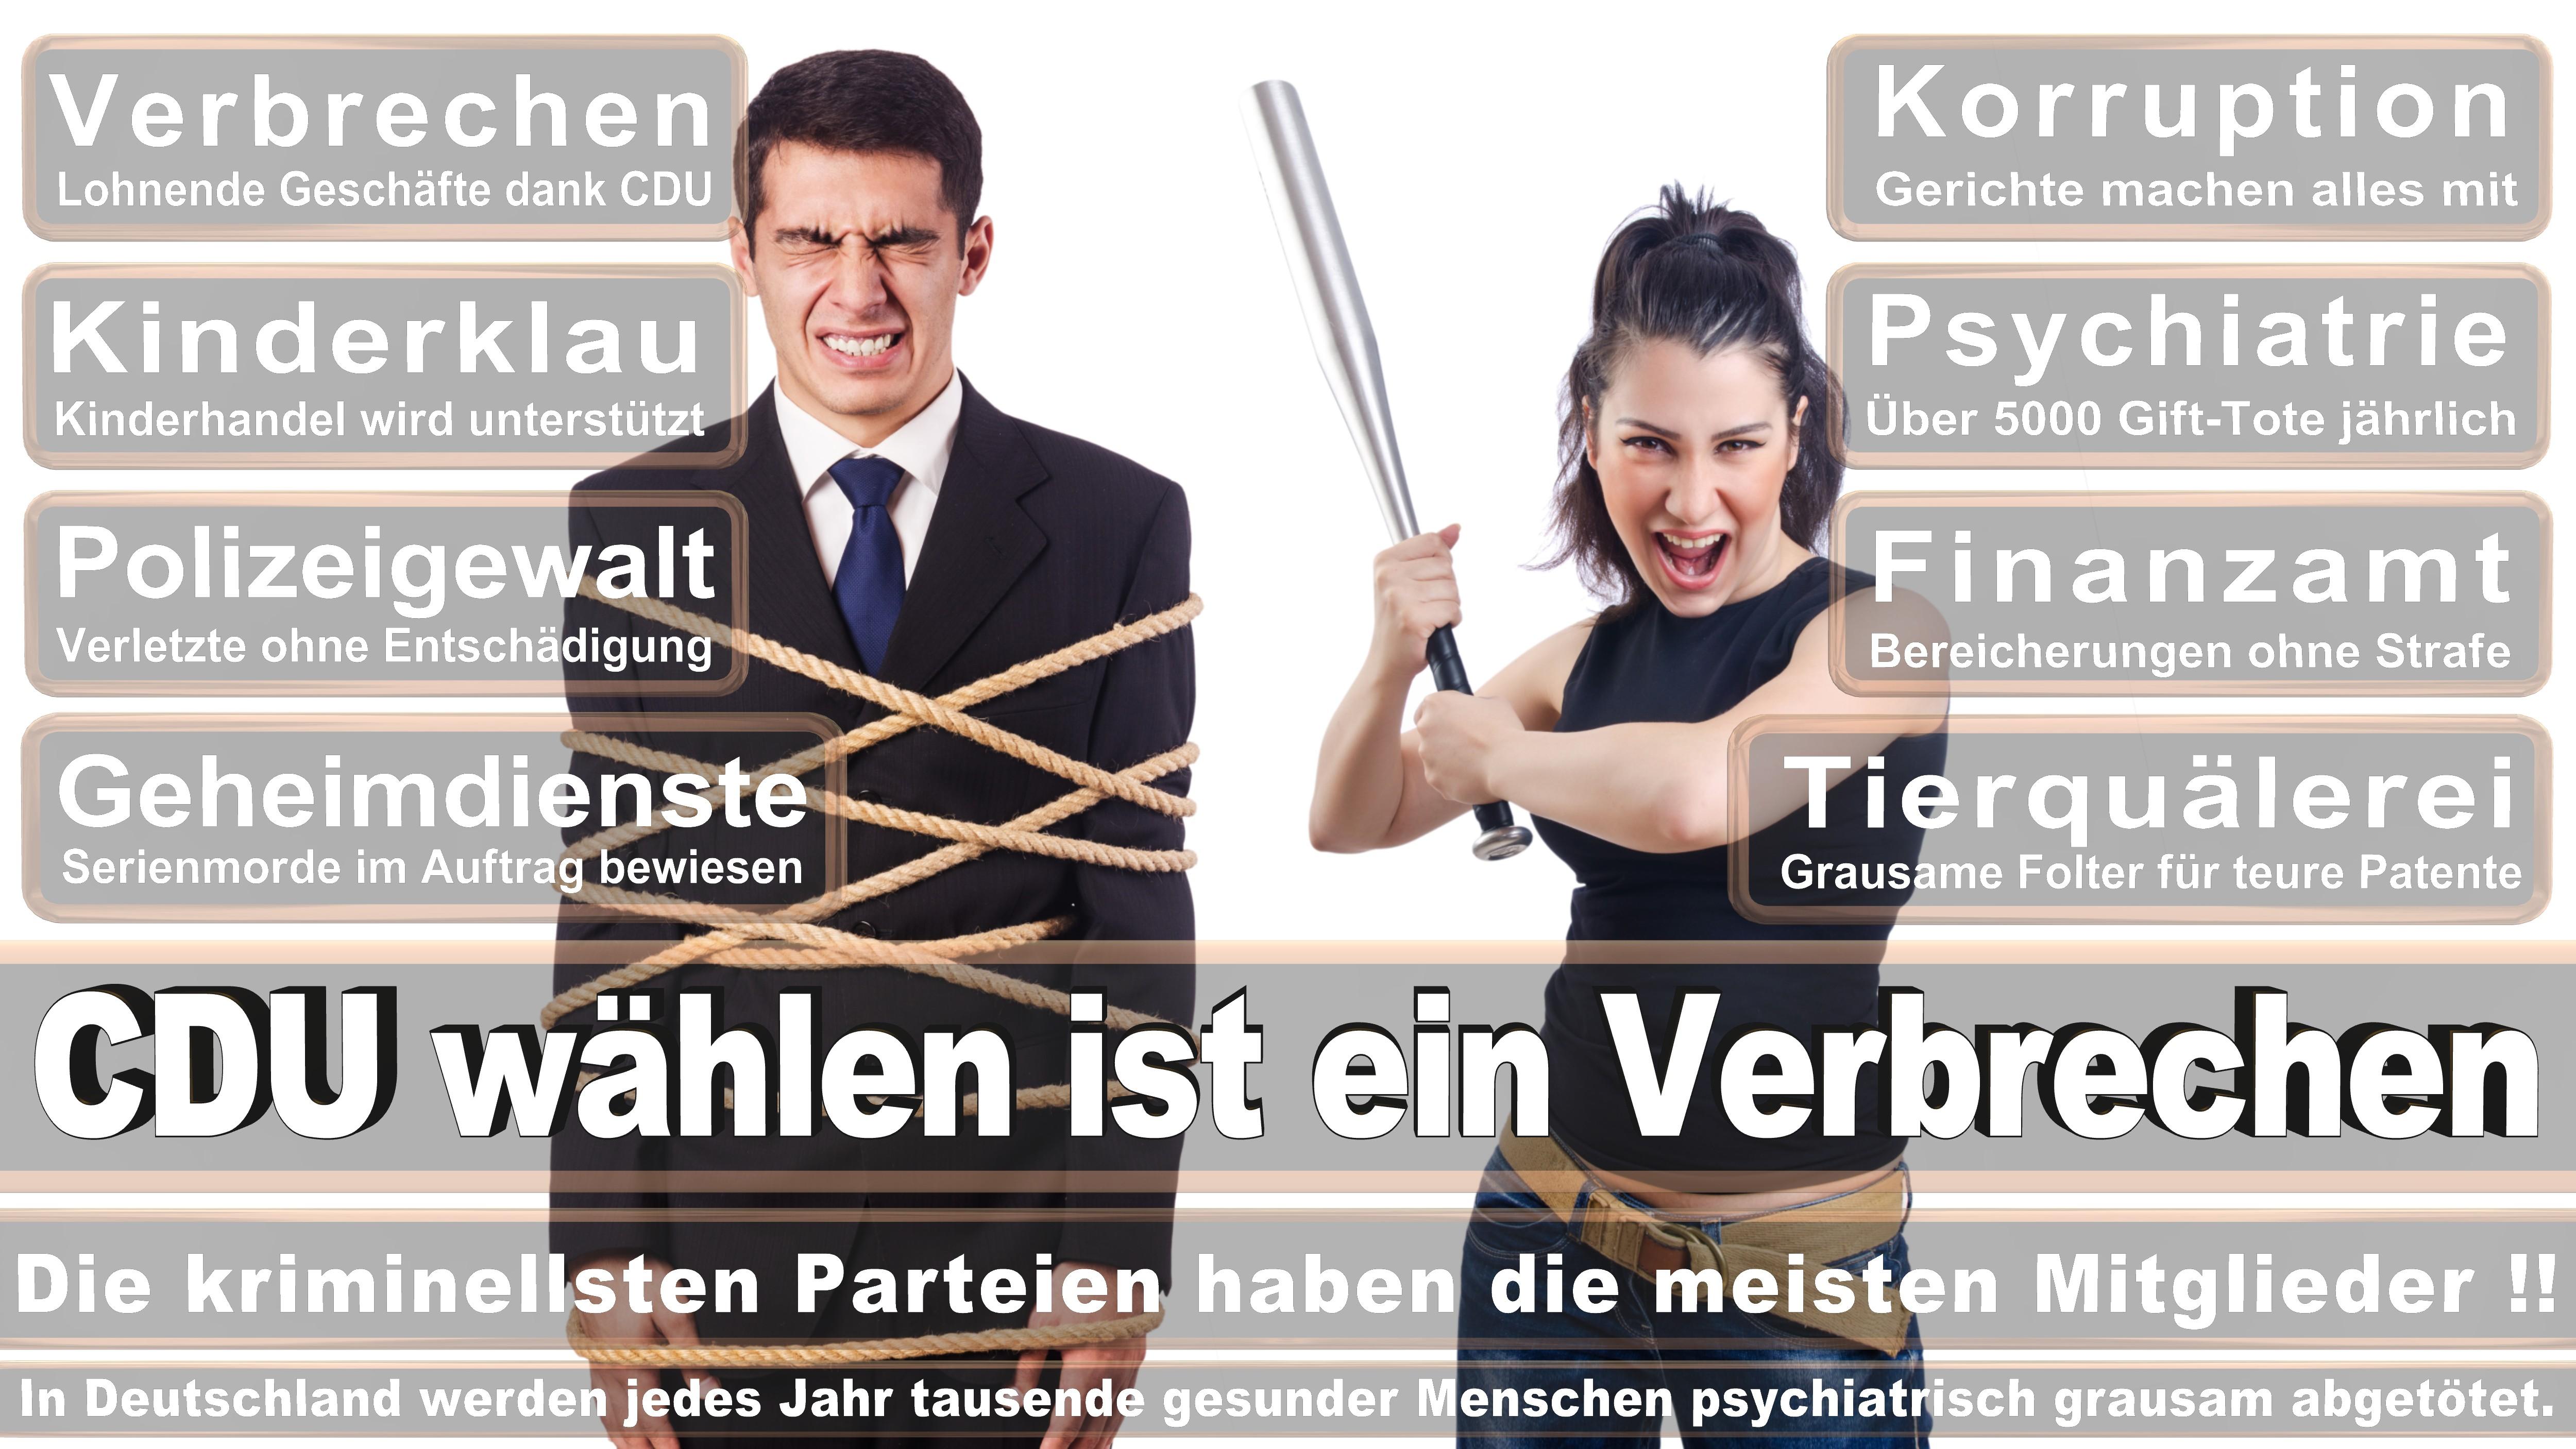 Reinhold Jost SPD Saarland Ausgeschieden Am Januar Politiker Deutschland